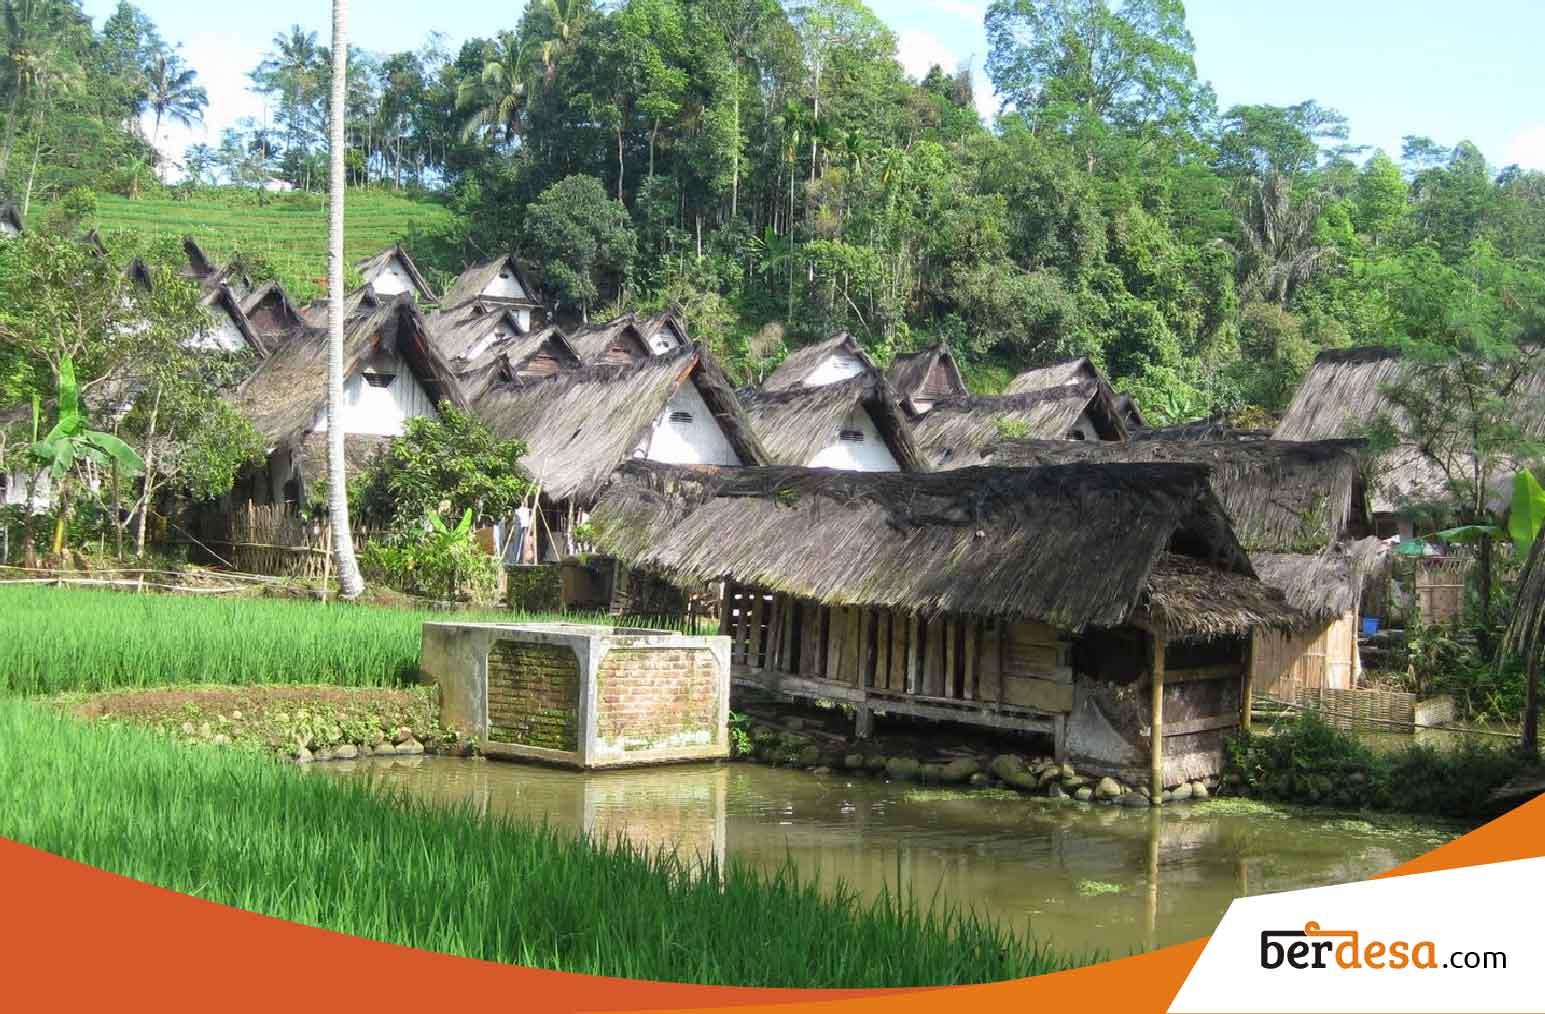 Rumah Idaman Sederhana Di Desa Untuk Keluarga Yang Menyukai Ketenangan Berdesa Rumah desa yang asri